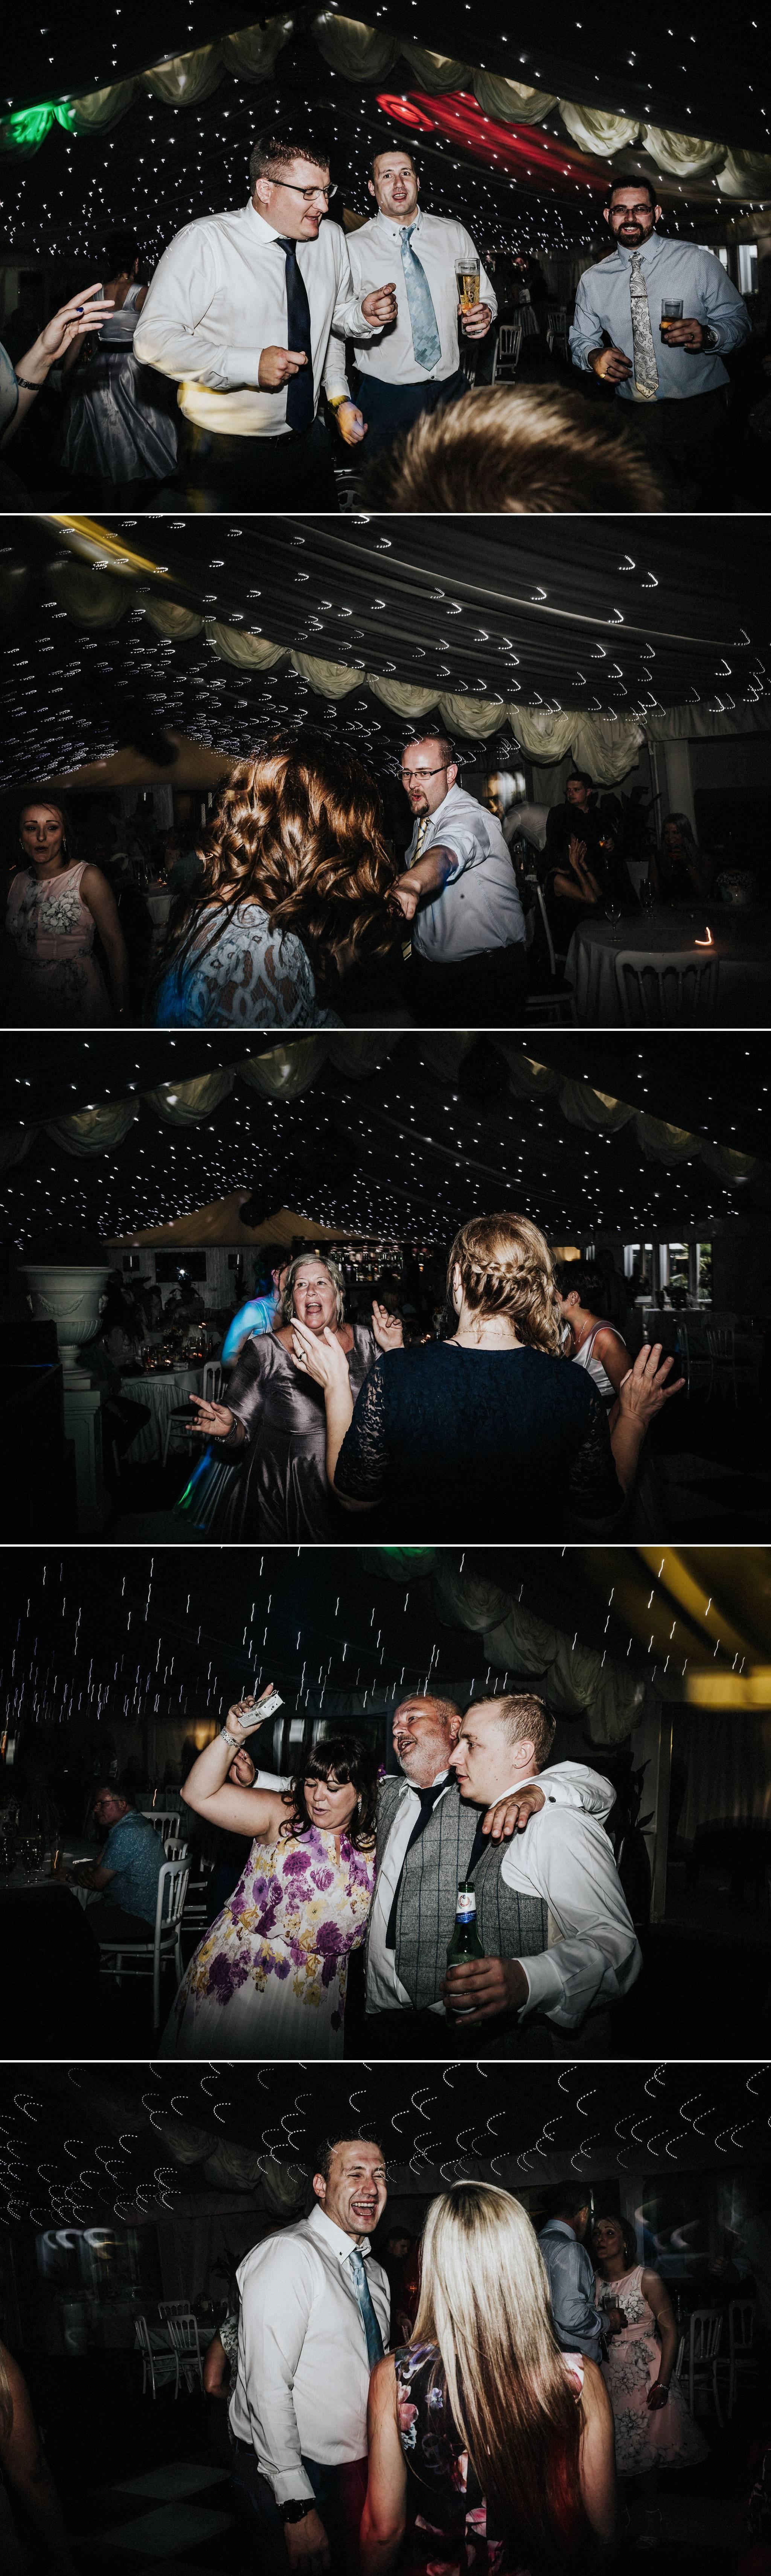 moxhull-hall-wedding-photography 24.jpg